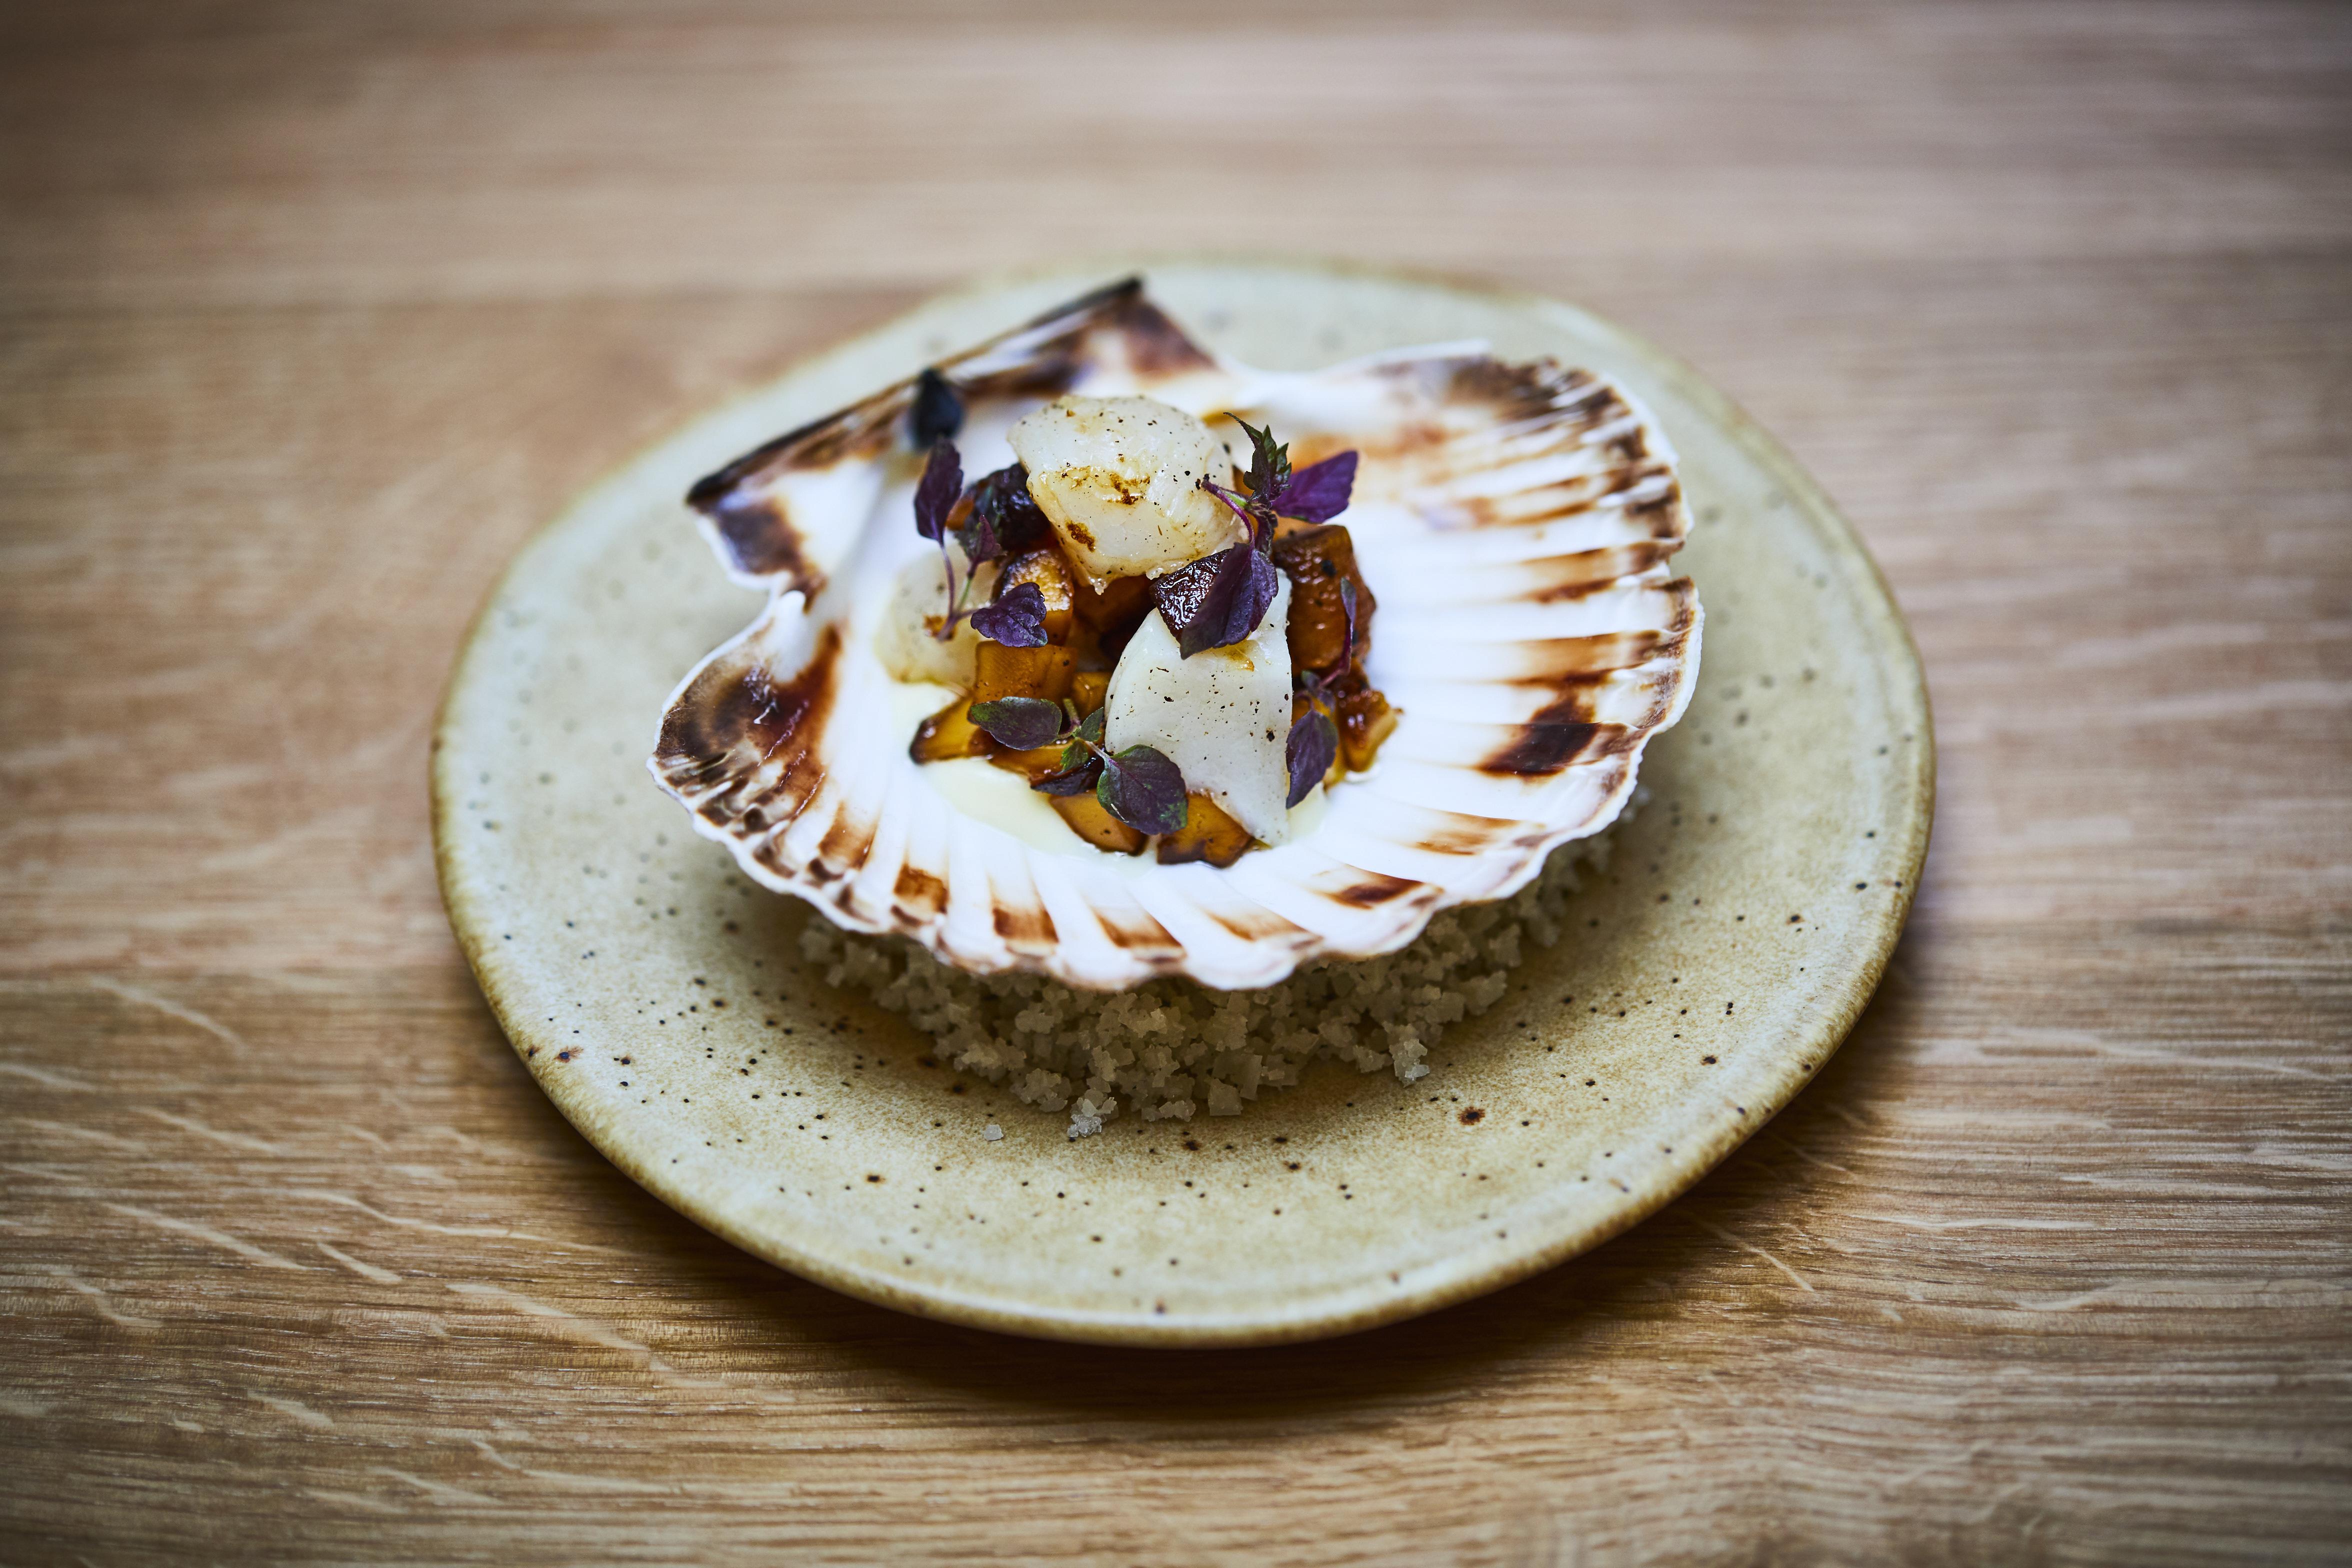 2018's Hottest Chef Duo Set Opening Date for Hebridean Neighbourhood Restaurant [Updated]